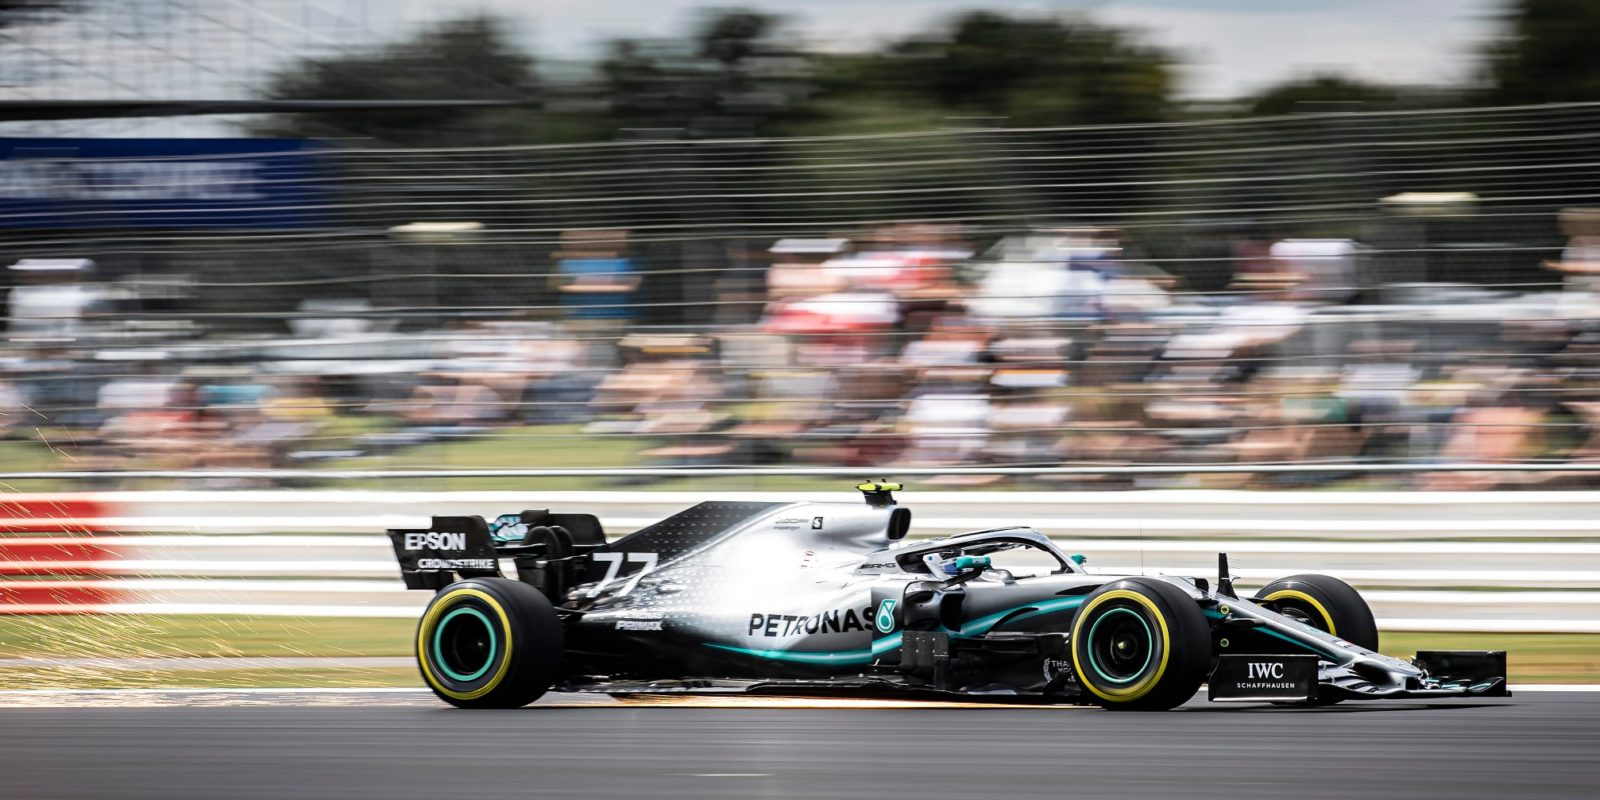 Kvalifikaci ve Velké Británii vyhrál Valtteri Bottas